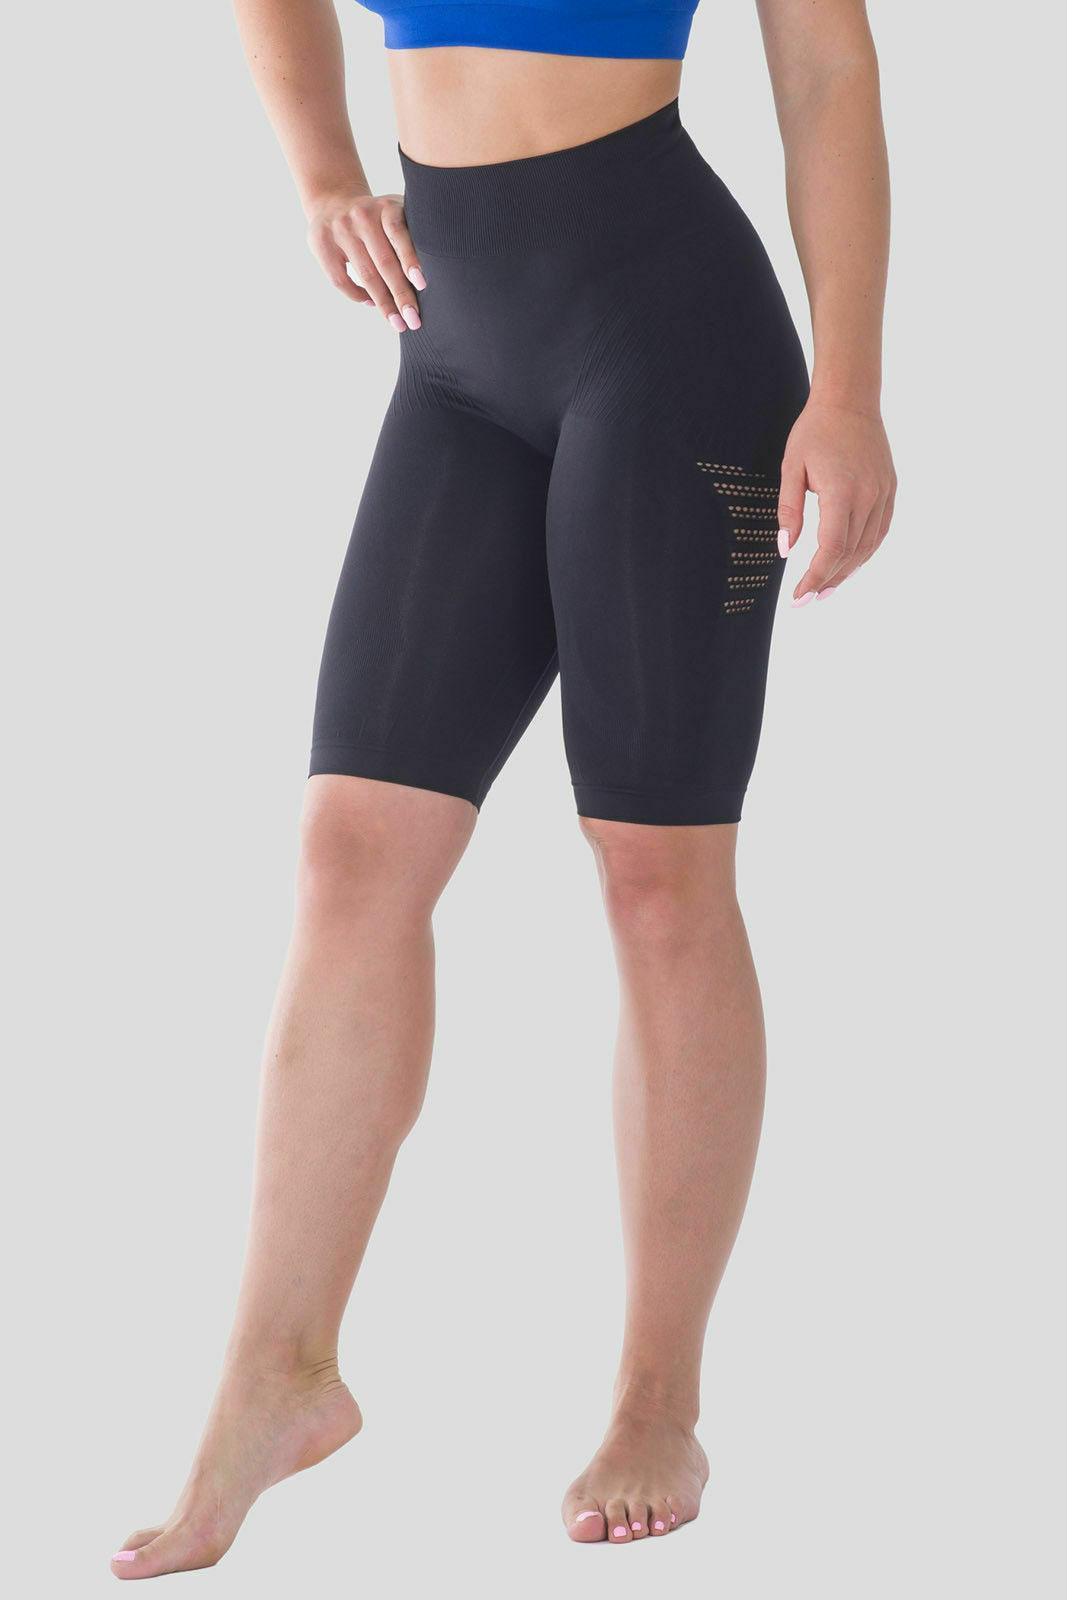 Bellissima-Women-039-s-Compression-Sport-Yoga-Shorts-High-Waist-Workout-Running thumbnail 10